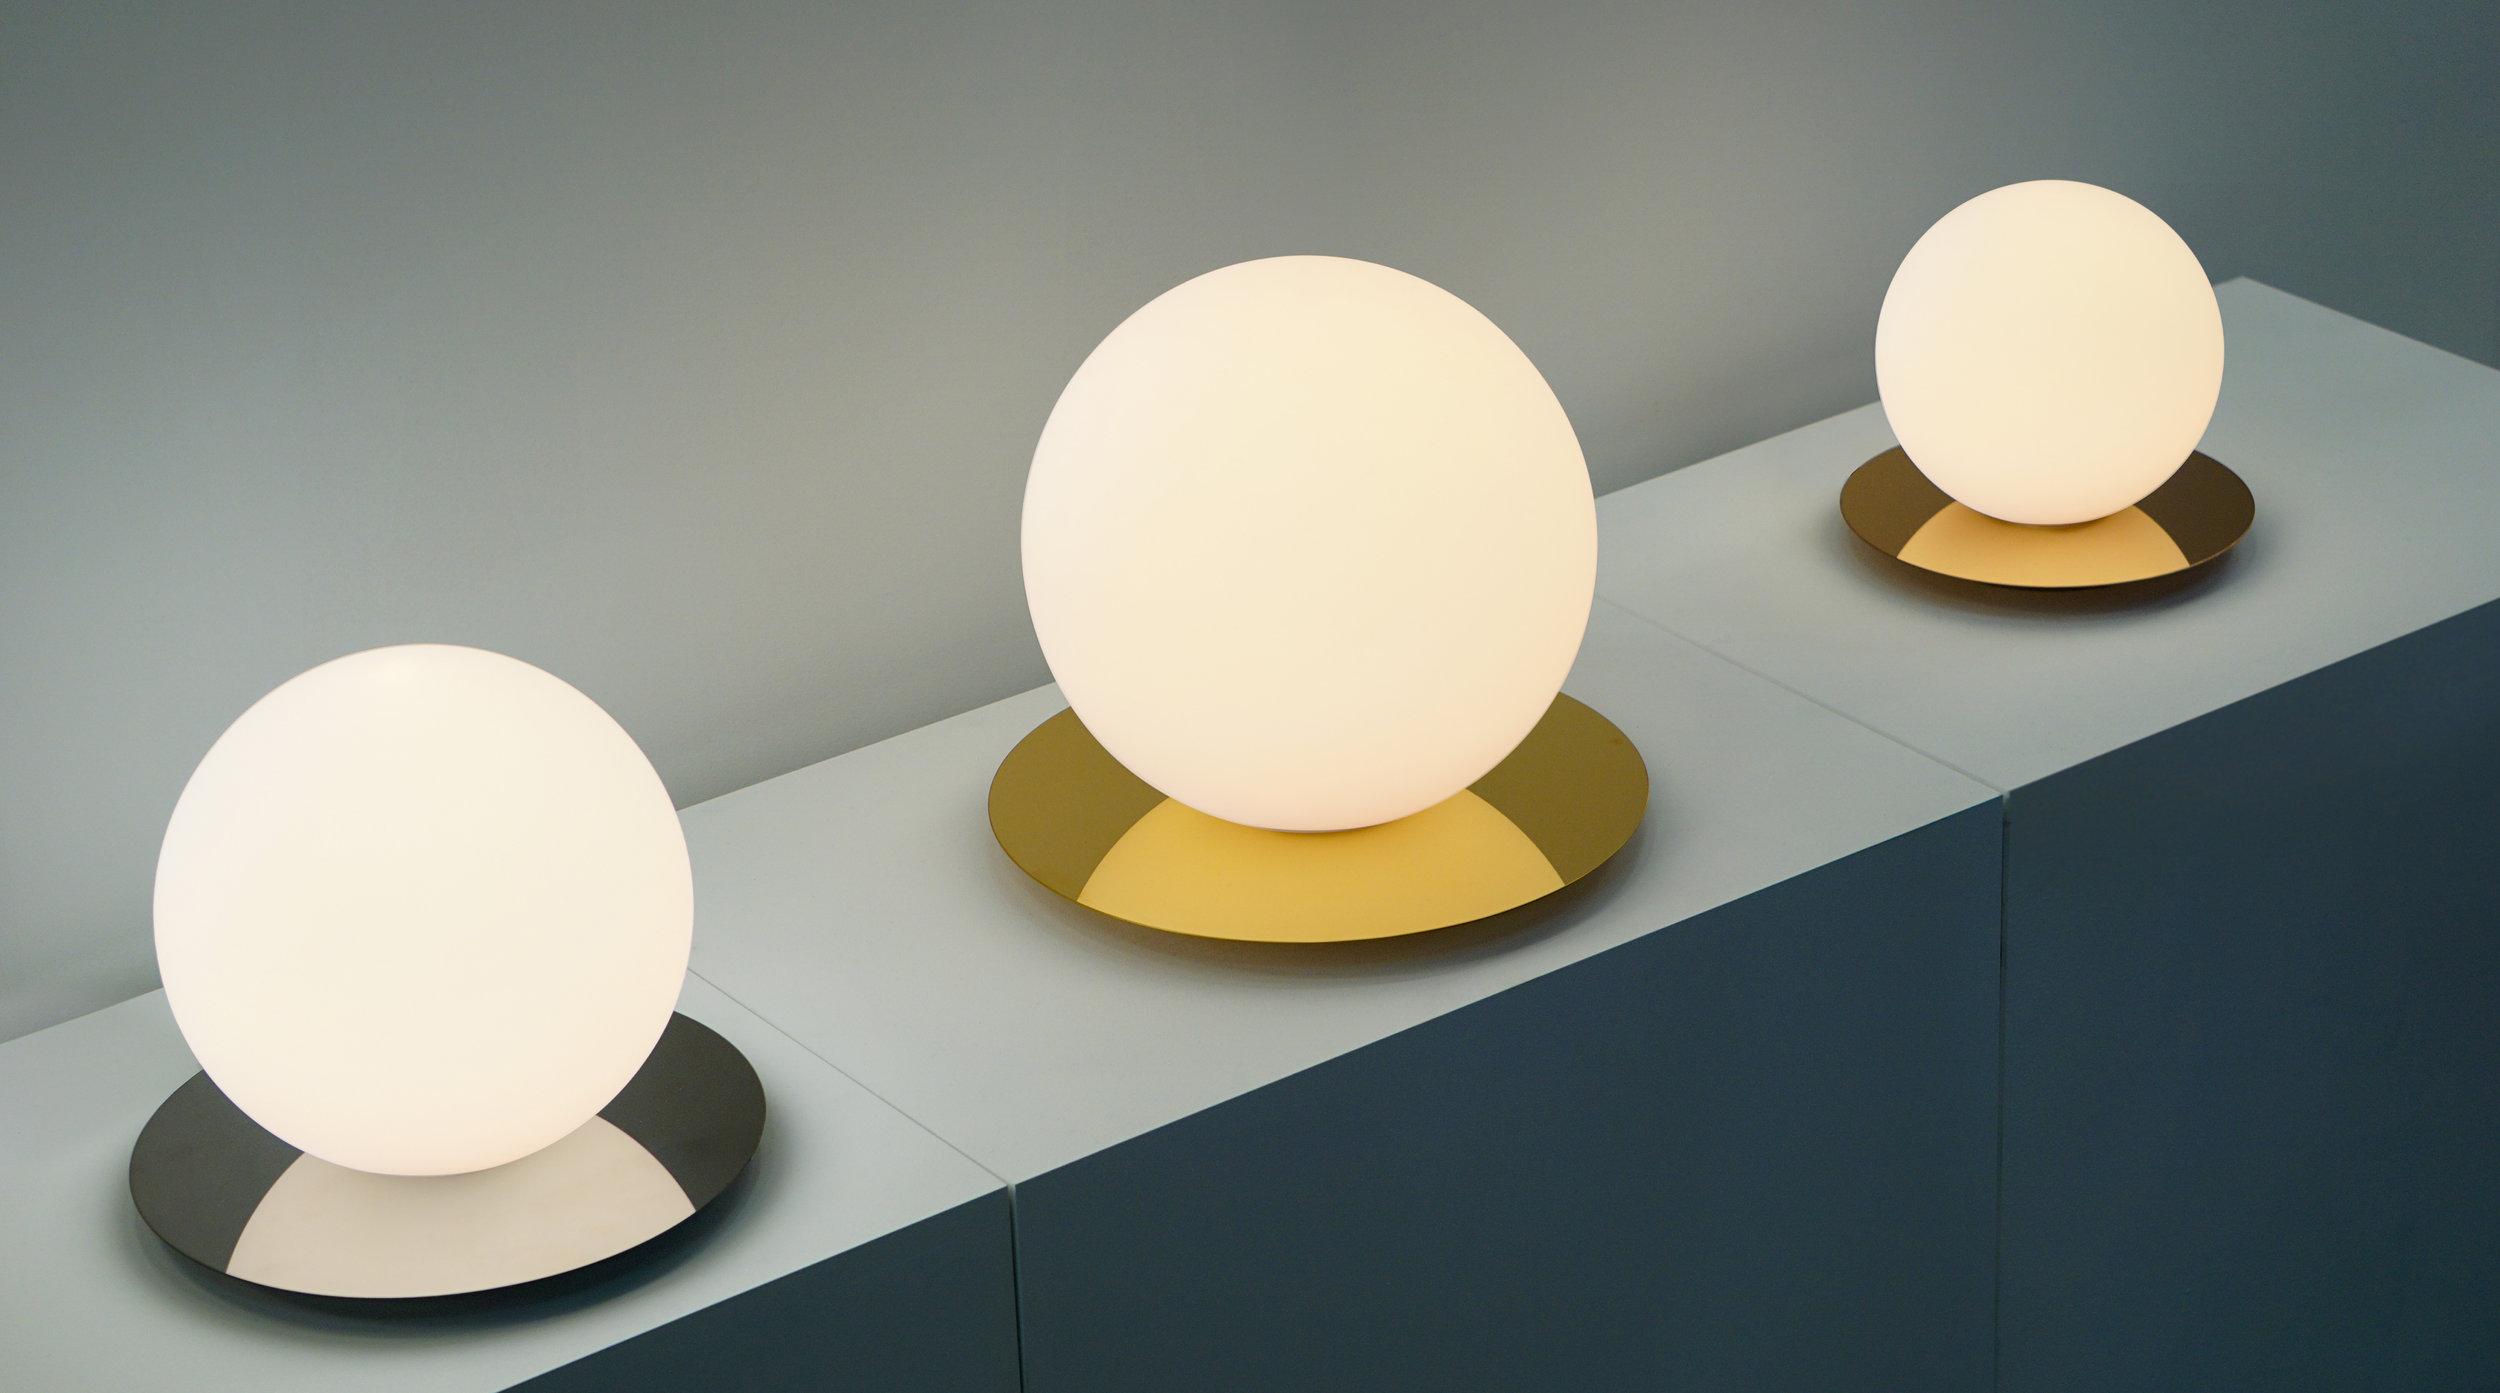 Bola Sphere Table, Evironmental, Trade Show 2_300.jpg